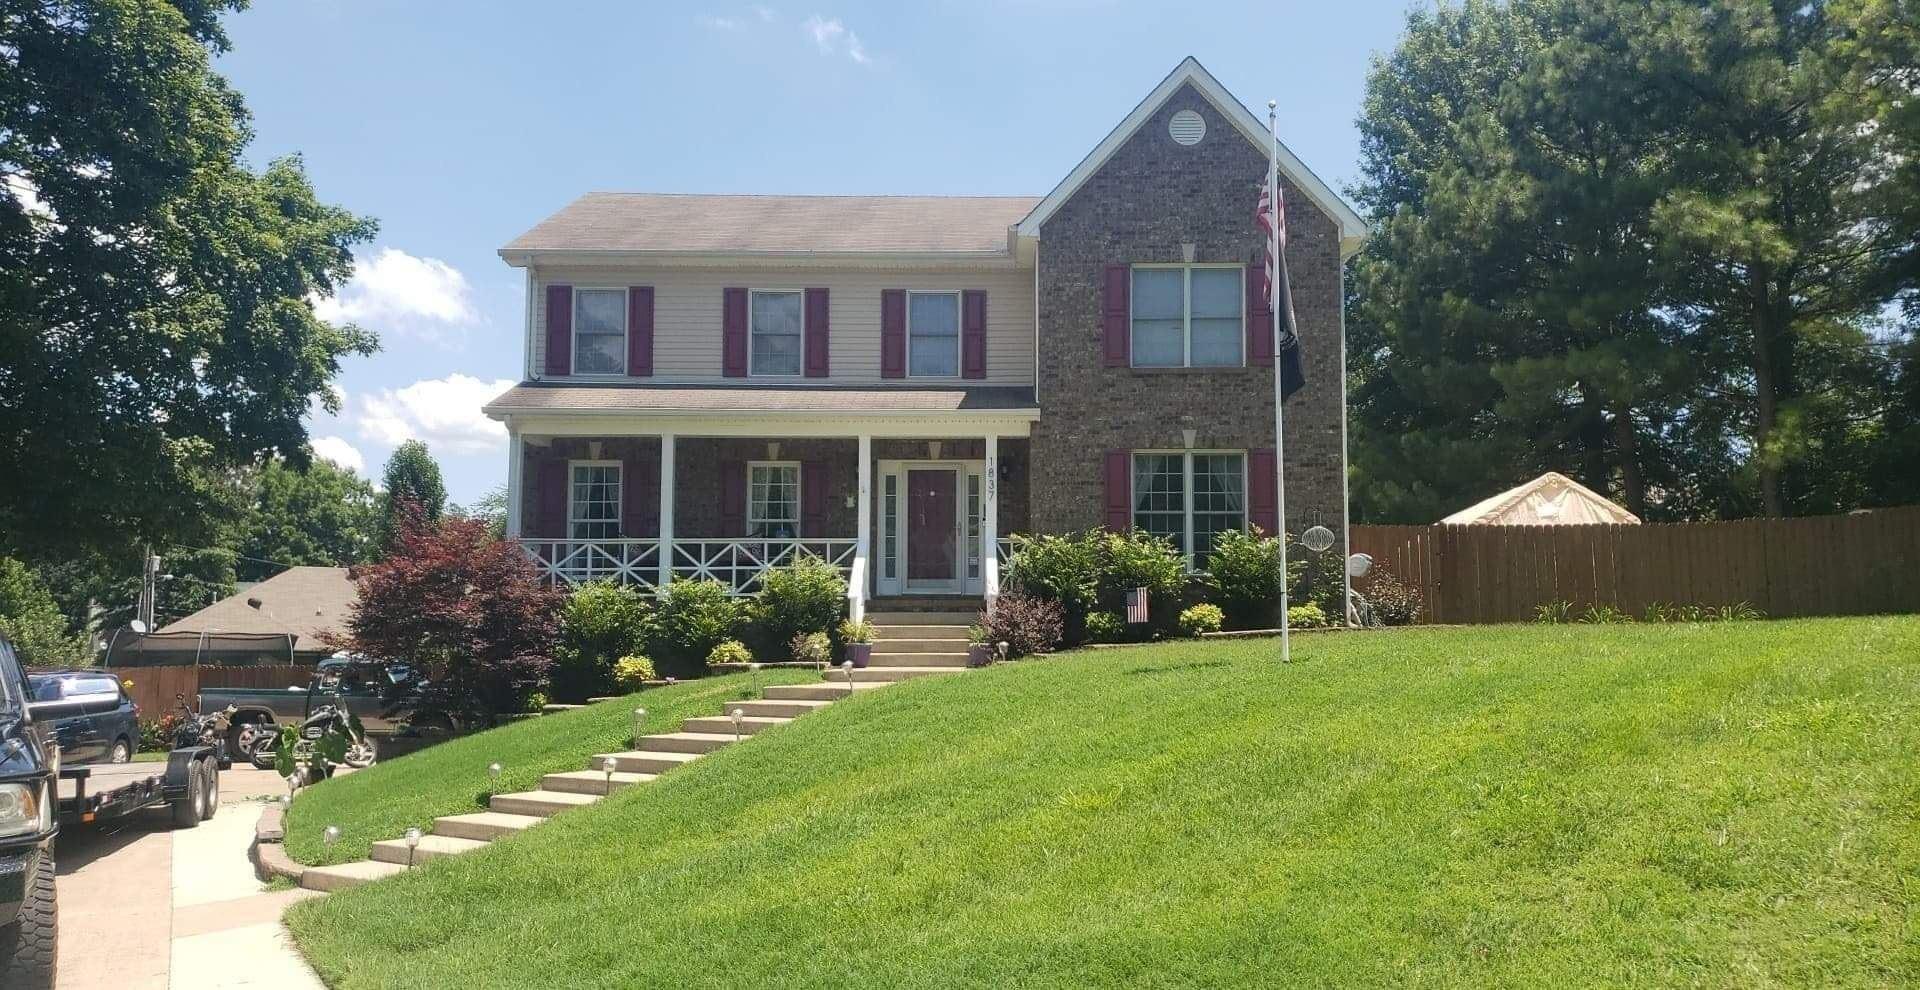 1837 Springs Inn Rd, Clarksville, TN 37043 - MLS#: 2254466